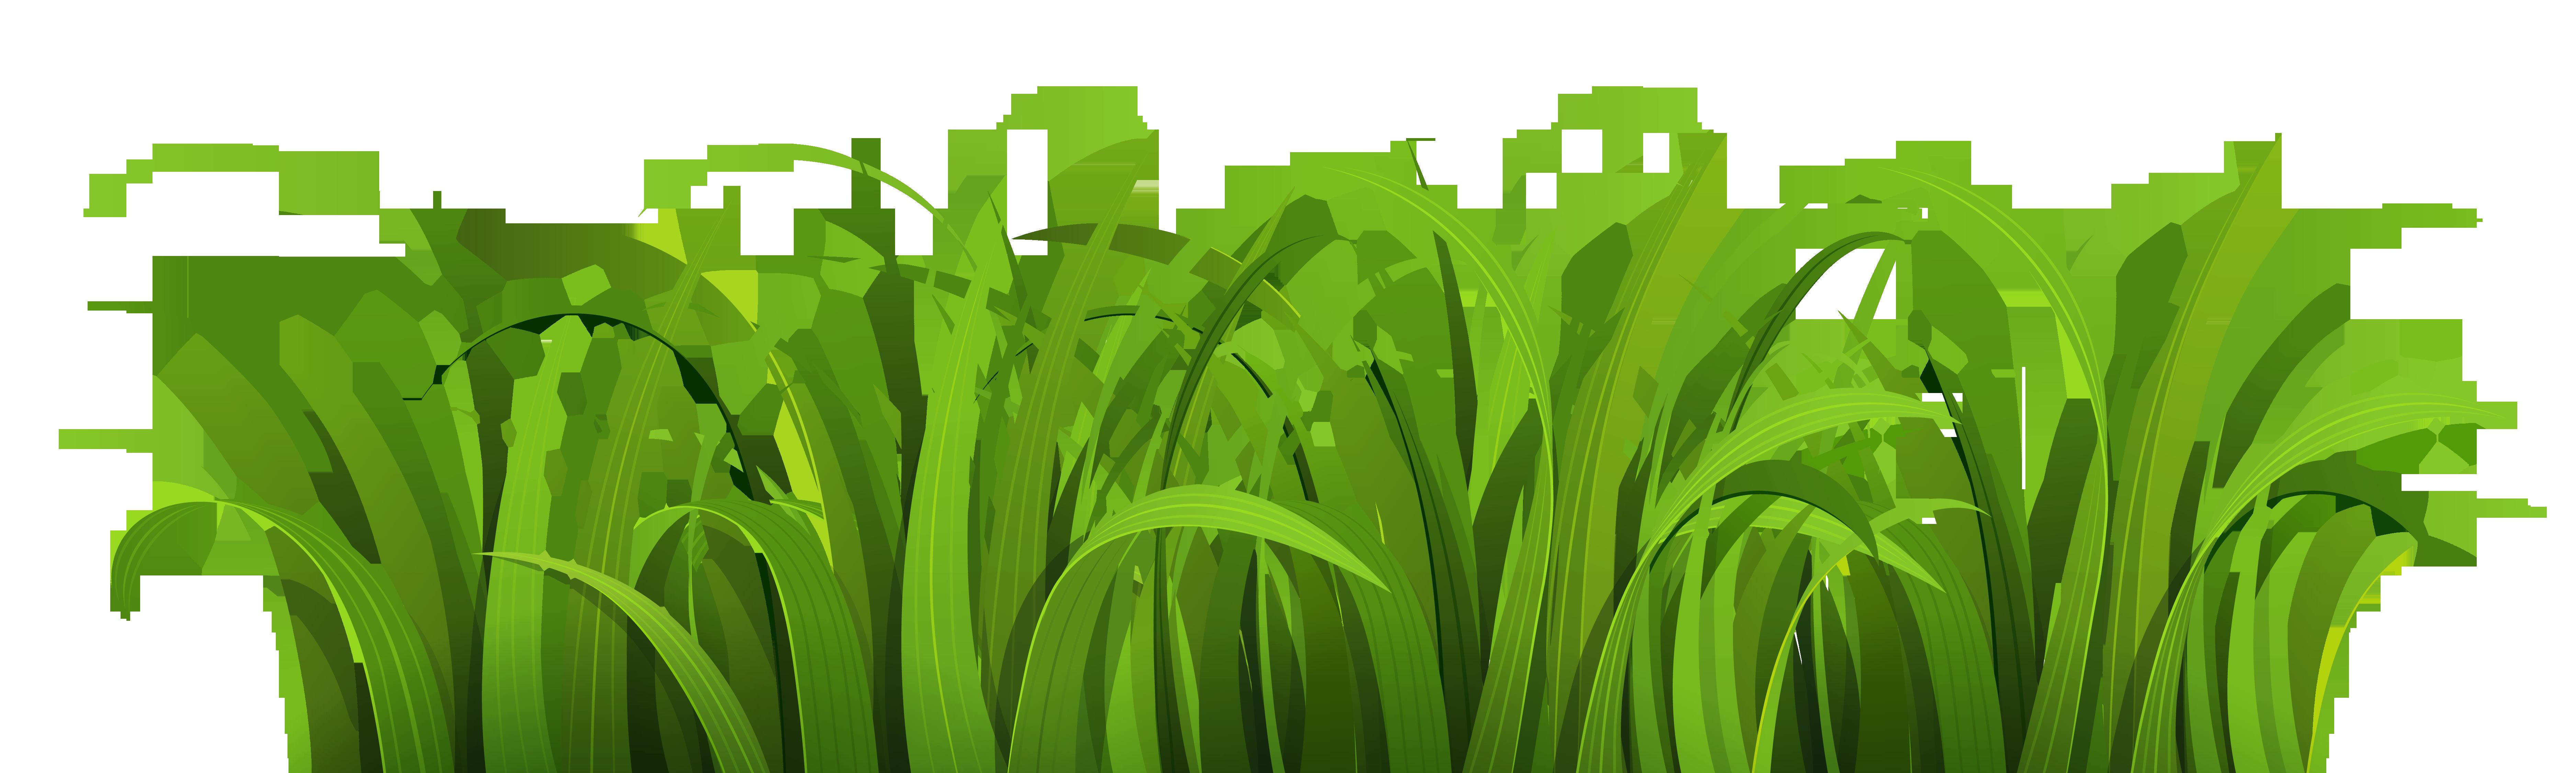 grass png image purepng free transparent cc0 png image divider clip art math divider clip art math